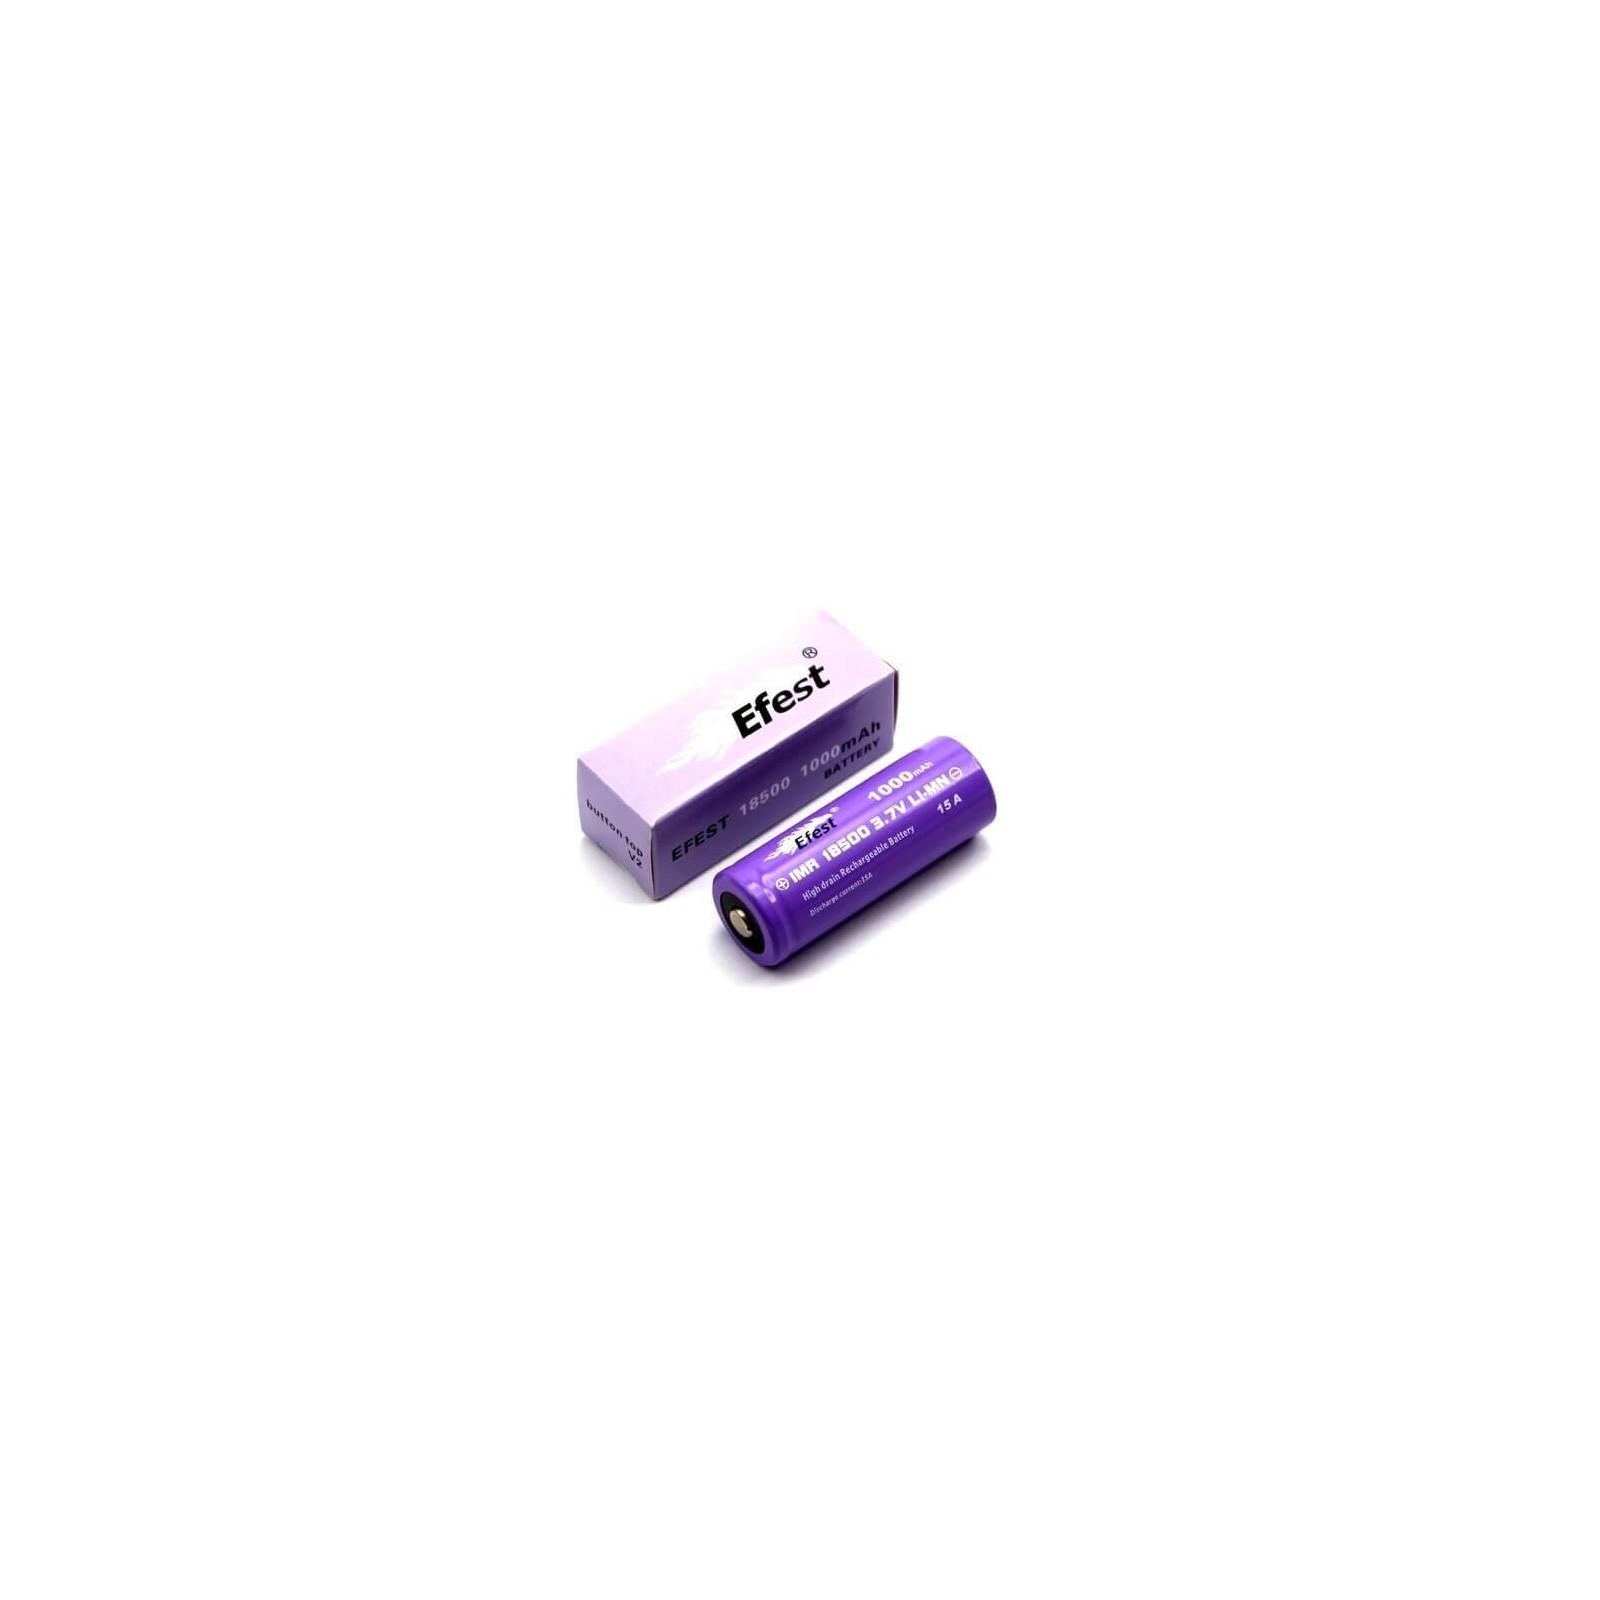 Accu Efest purple 18500 V1 1000 mAh - EFEST